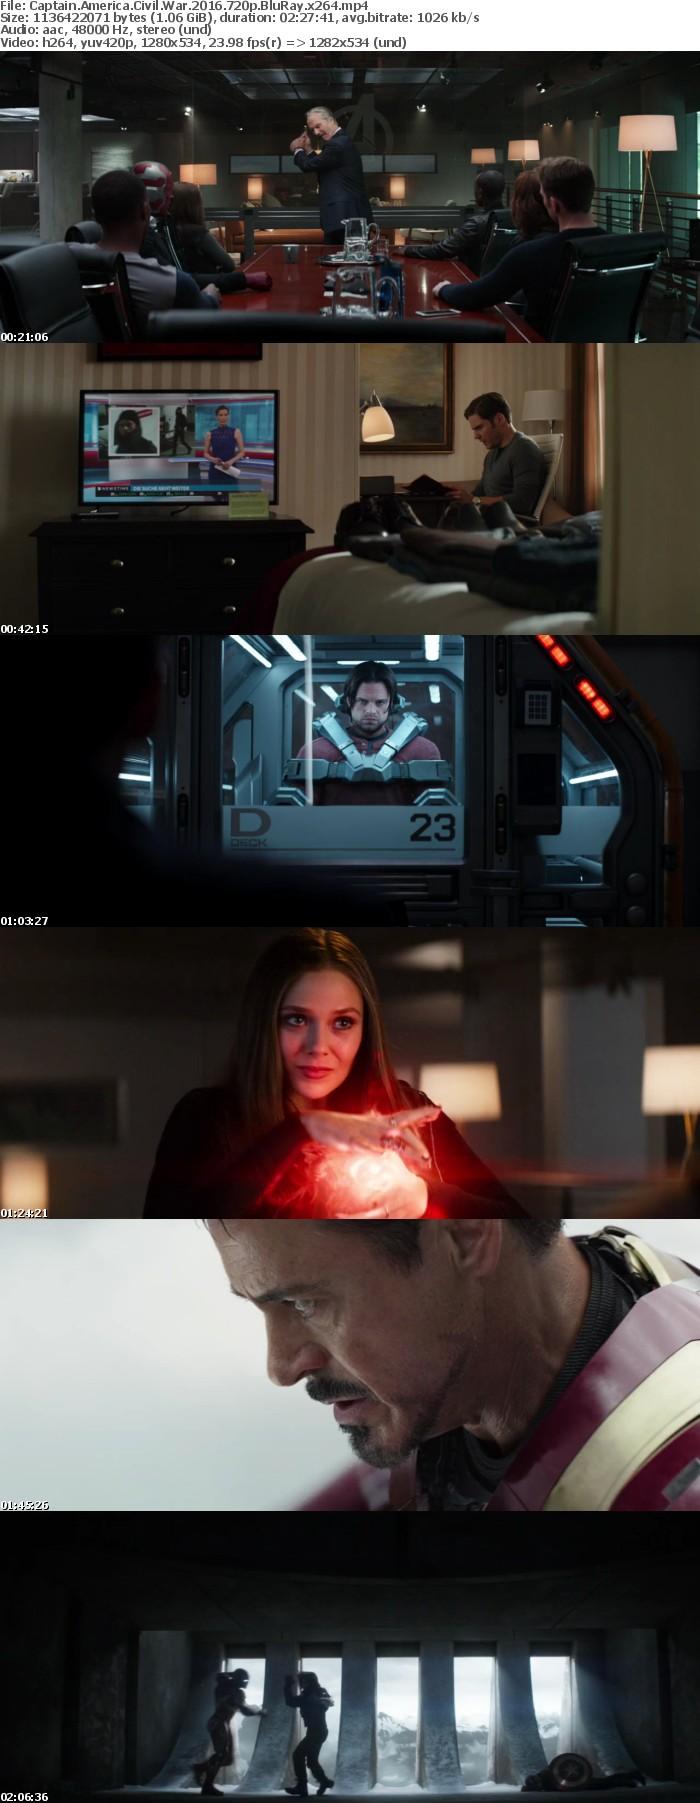 Captain America Civil War 2016 720p BluRay x264